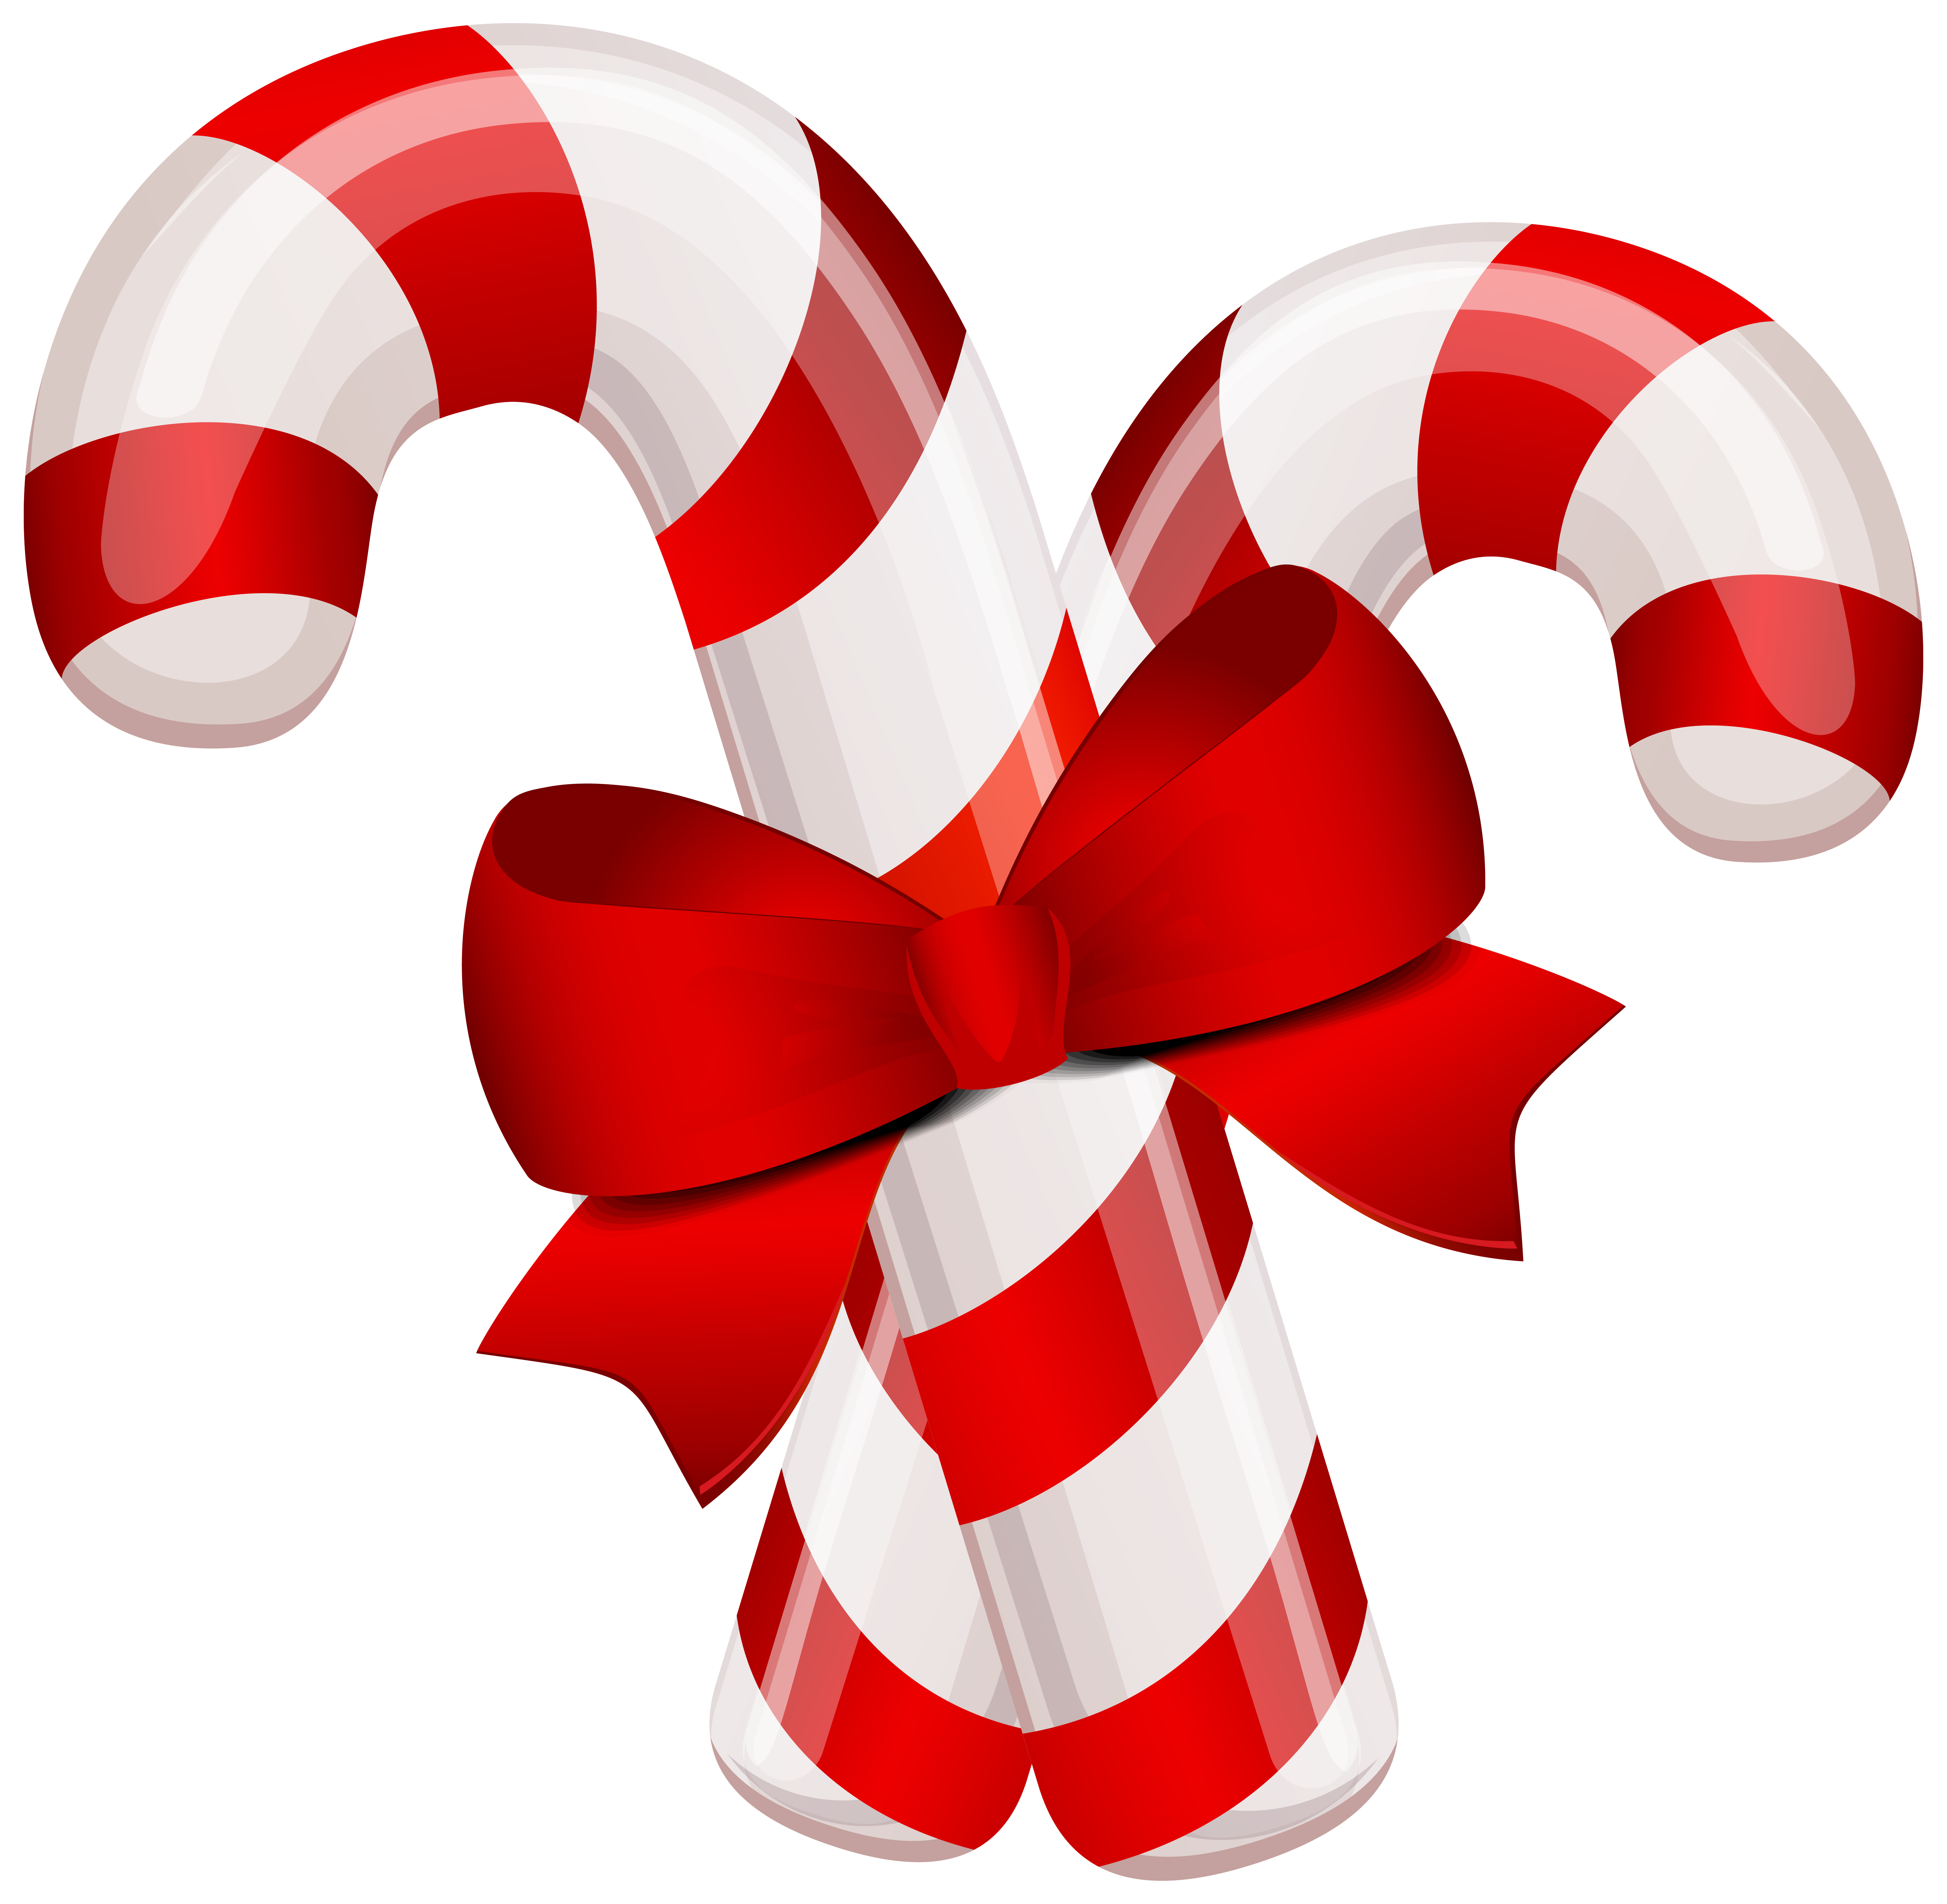 Christmas cane clipart image transparent download Candy Cane Christmas Classic Canes Clipart Image Gallery Png - AZPng image transparent download